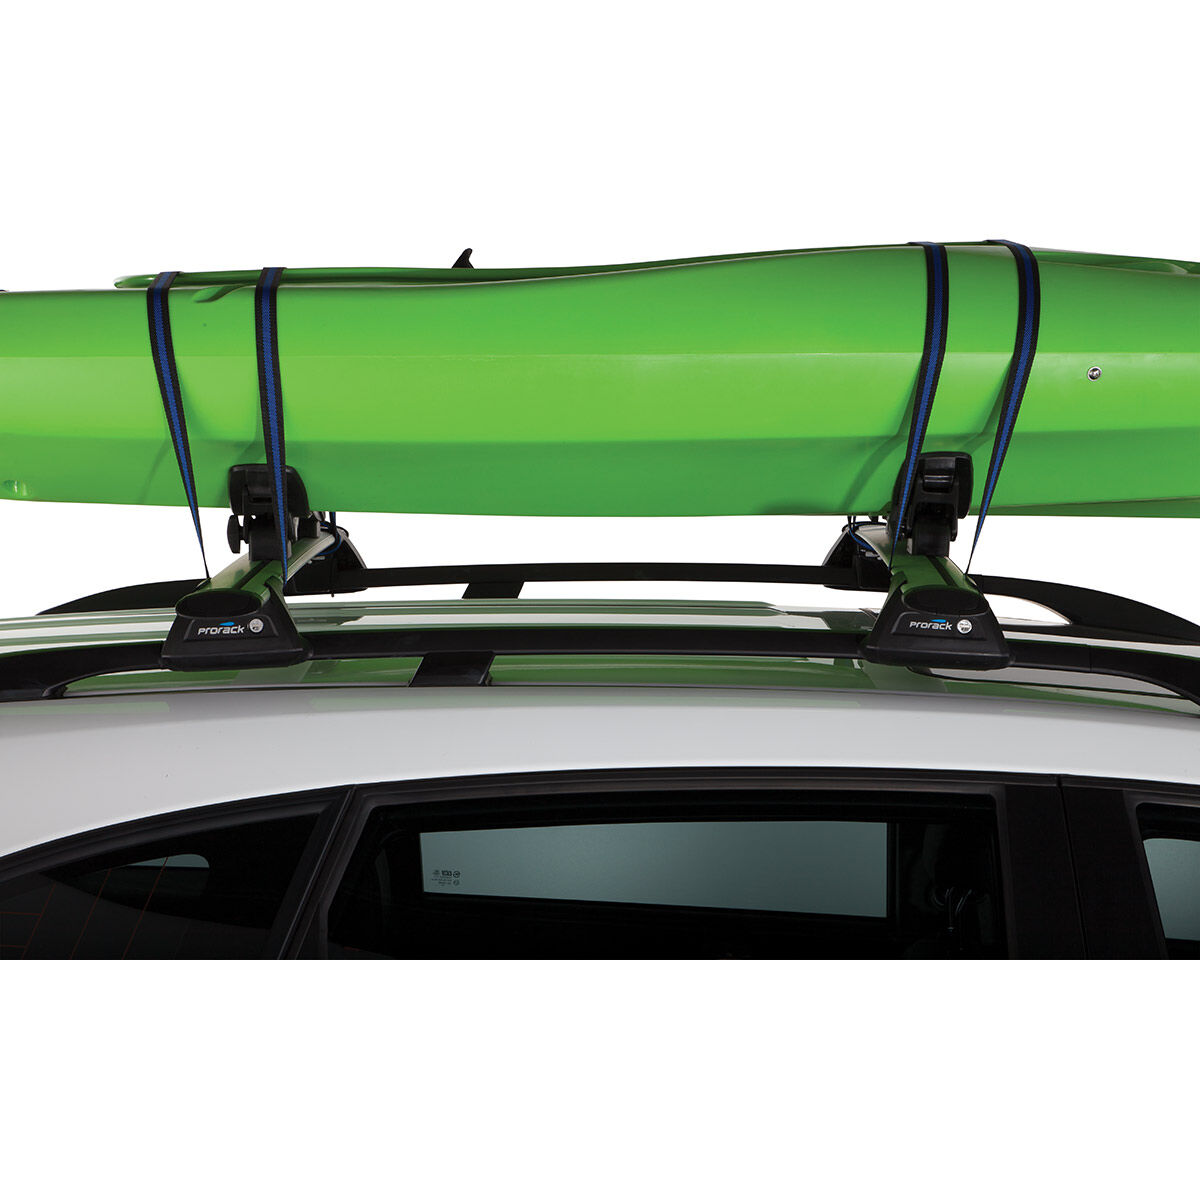 prorack roof rack kayak holder kit